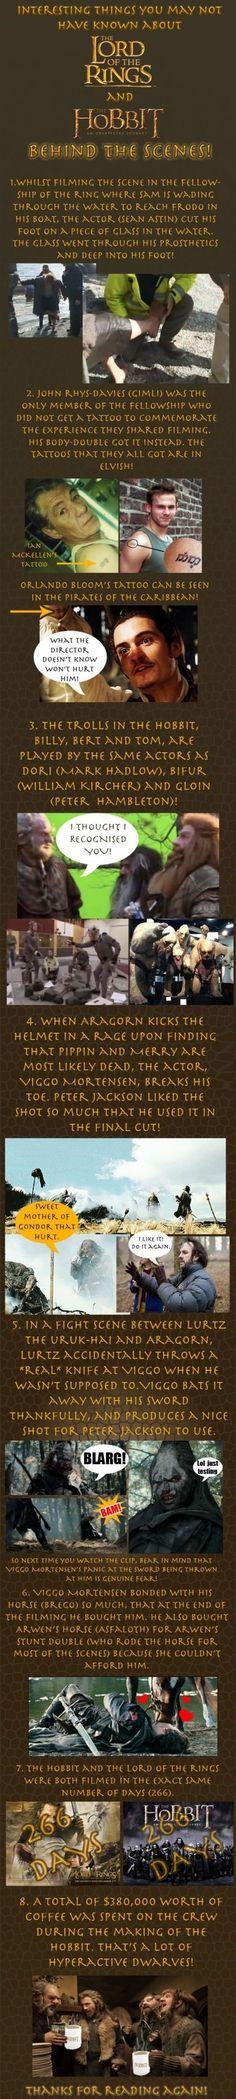 Lotr & Hobbit Behind the Scenes Facts